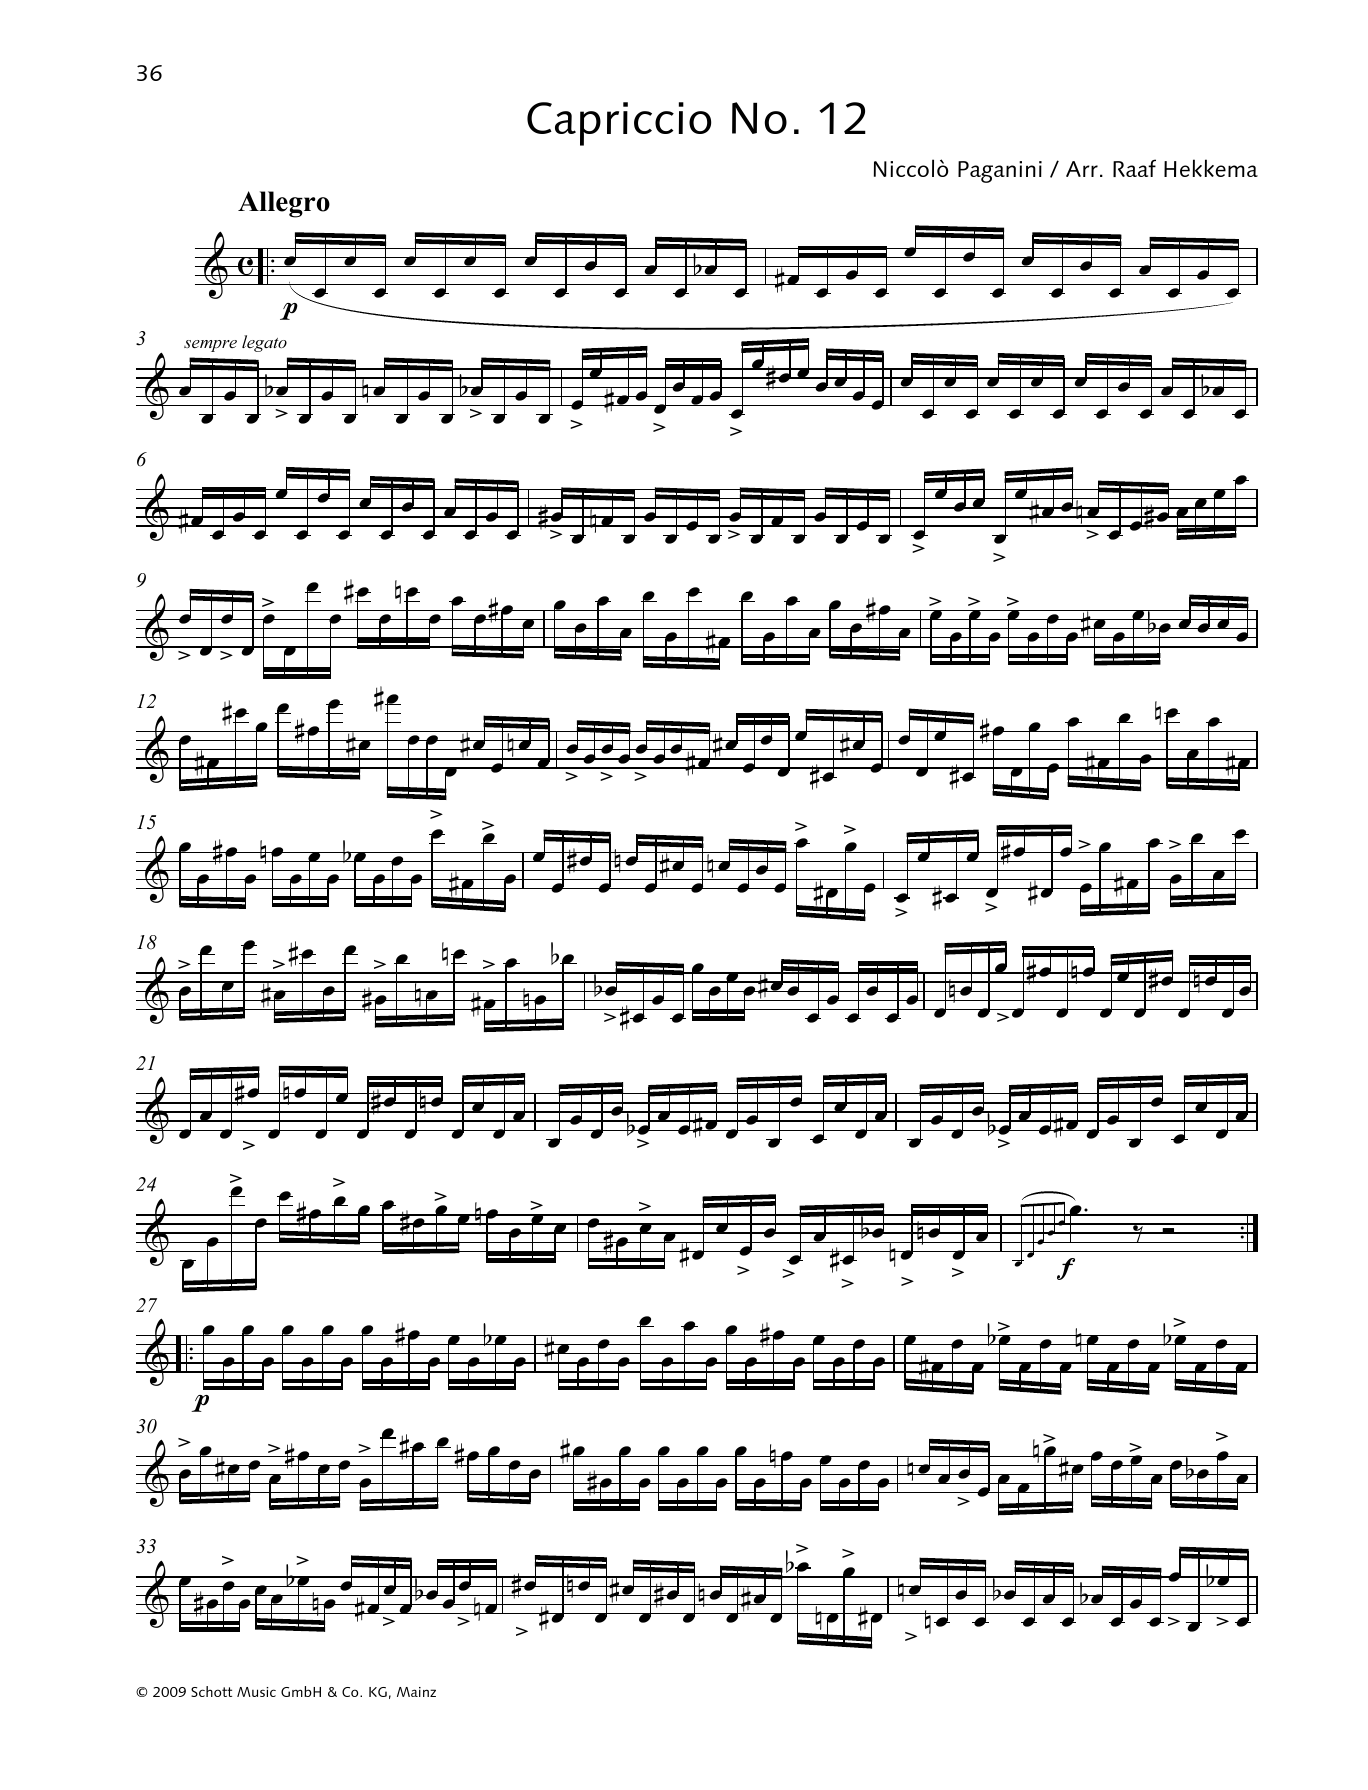 Capriccio No. 12 Sheet Music